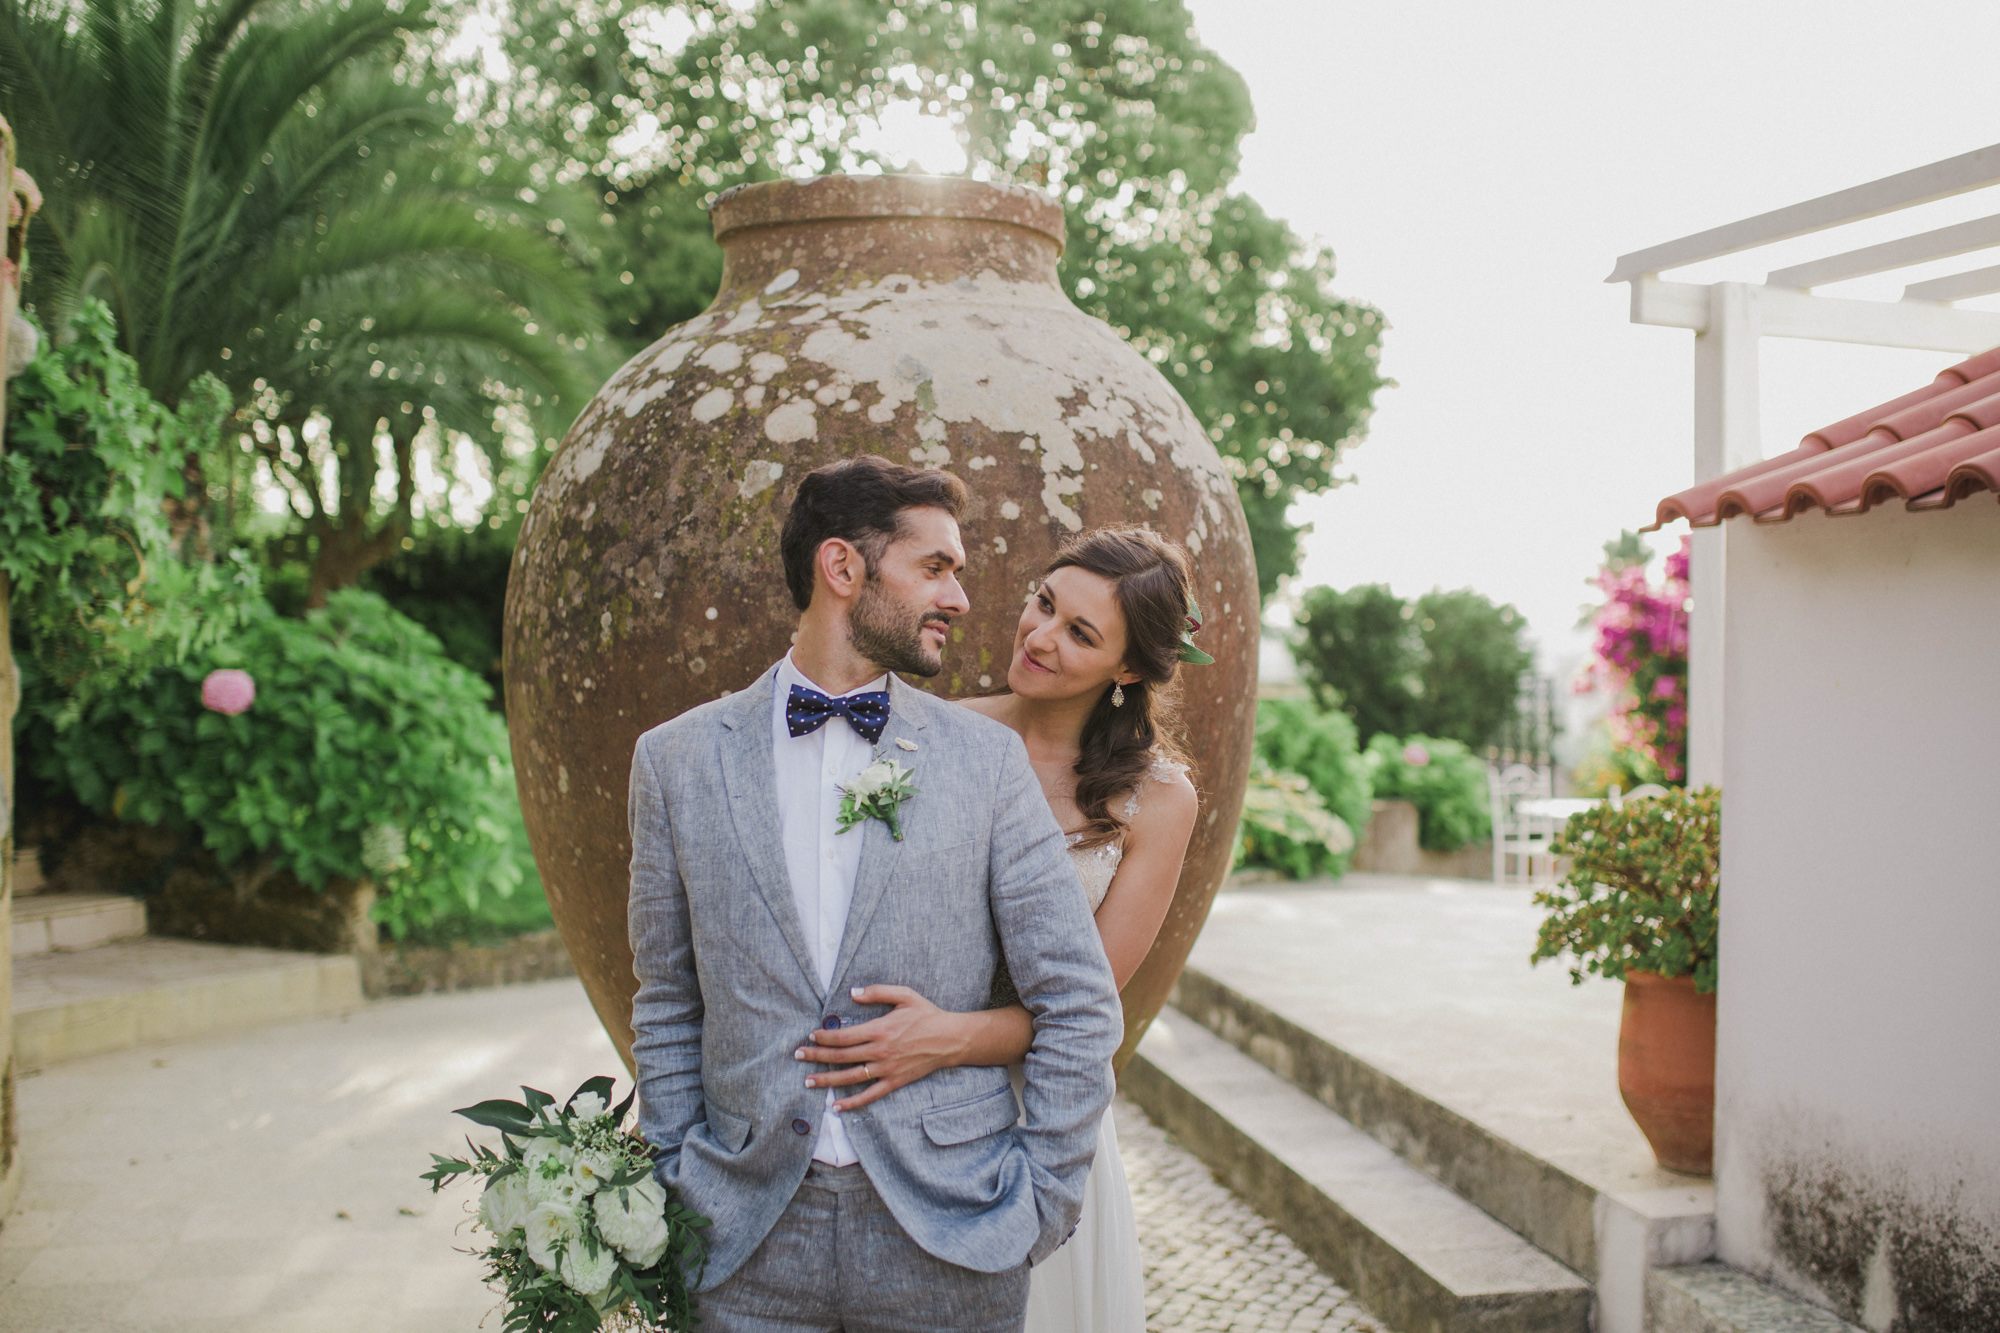 031-carina-e-samuel-wedding-casamento-quinta-dos-rouxinois-rustico-my-fancy-wedding-mafra-malveira-lisboa-sintra-cascais-filipe-santiago-fotografia-fotografo-lifestyle-destination-portugal